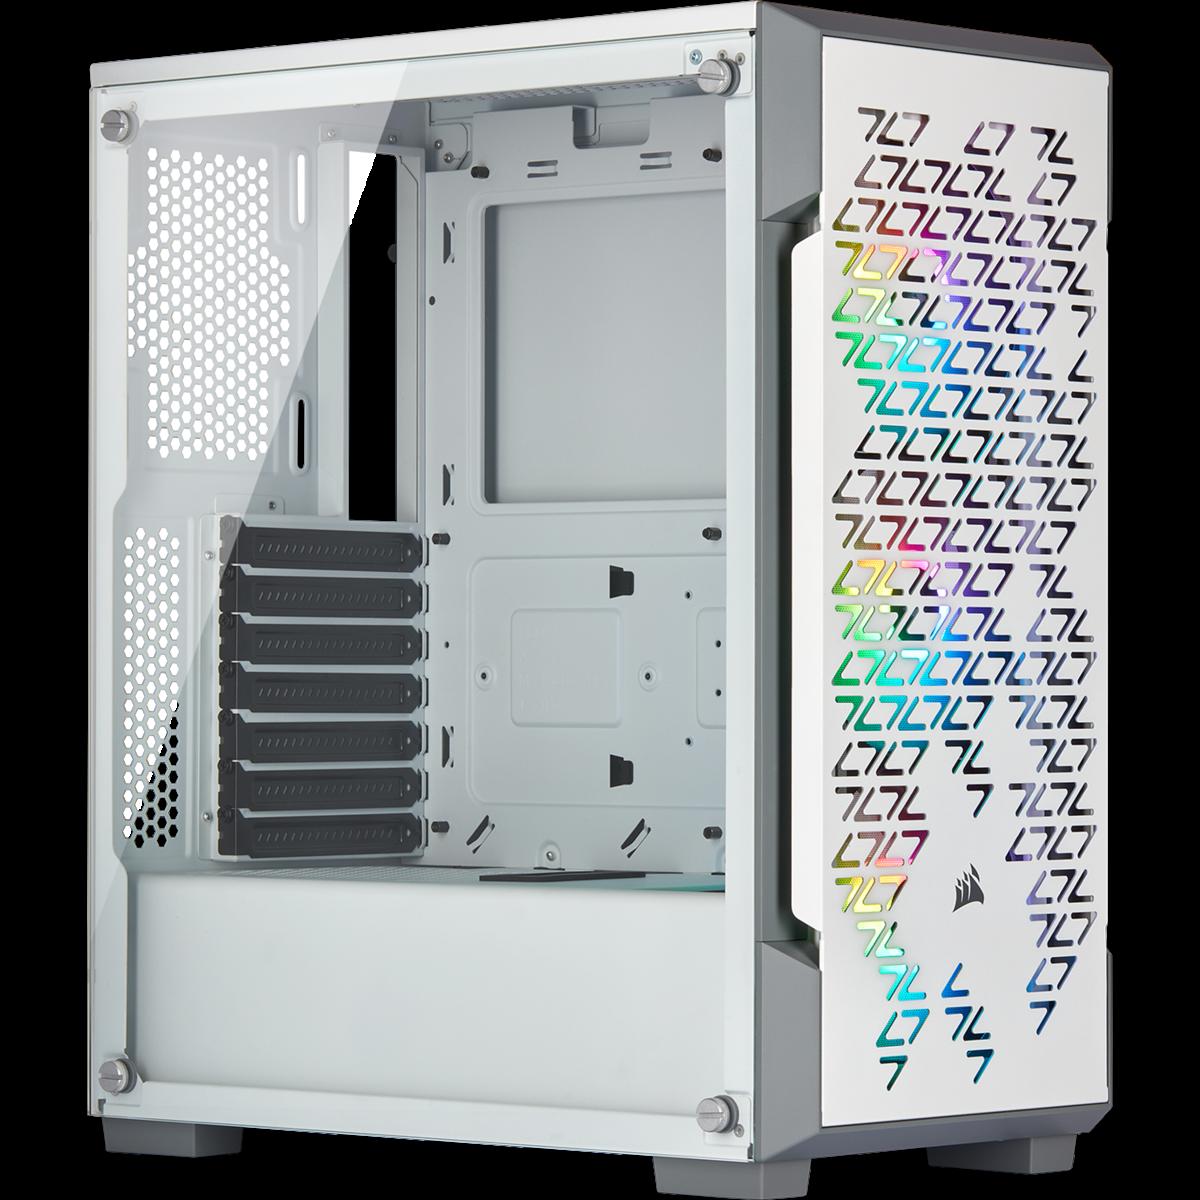 ICUE 220T AIRFLOW - WHITER + 3 FANS RGB - CORSAIR